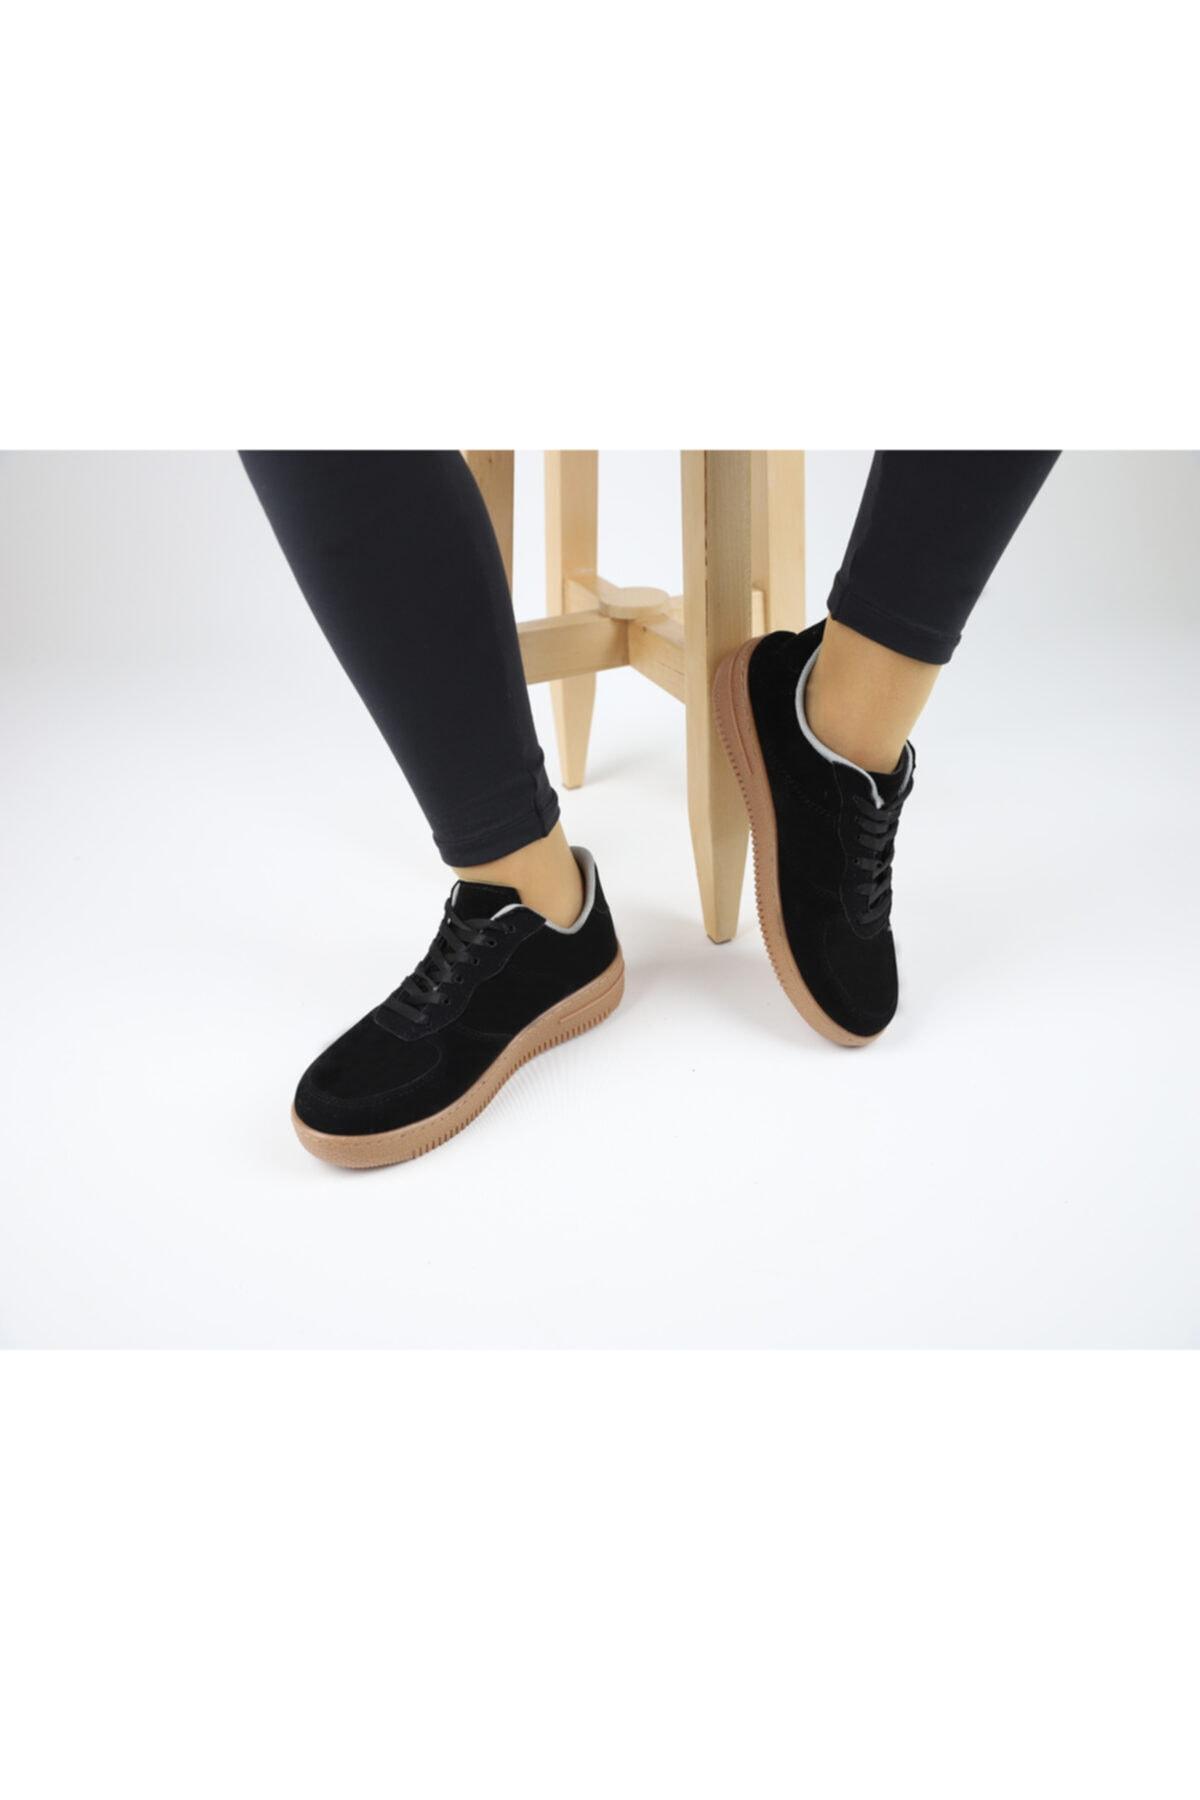 MSshopingg Kadın Siyah Casual Ayakkabı 1